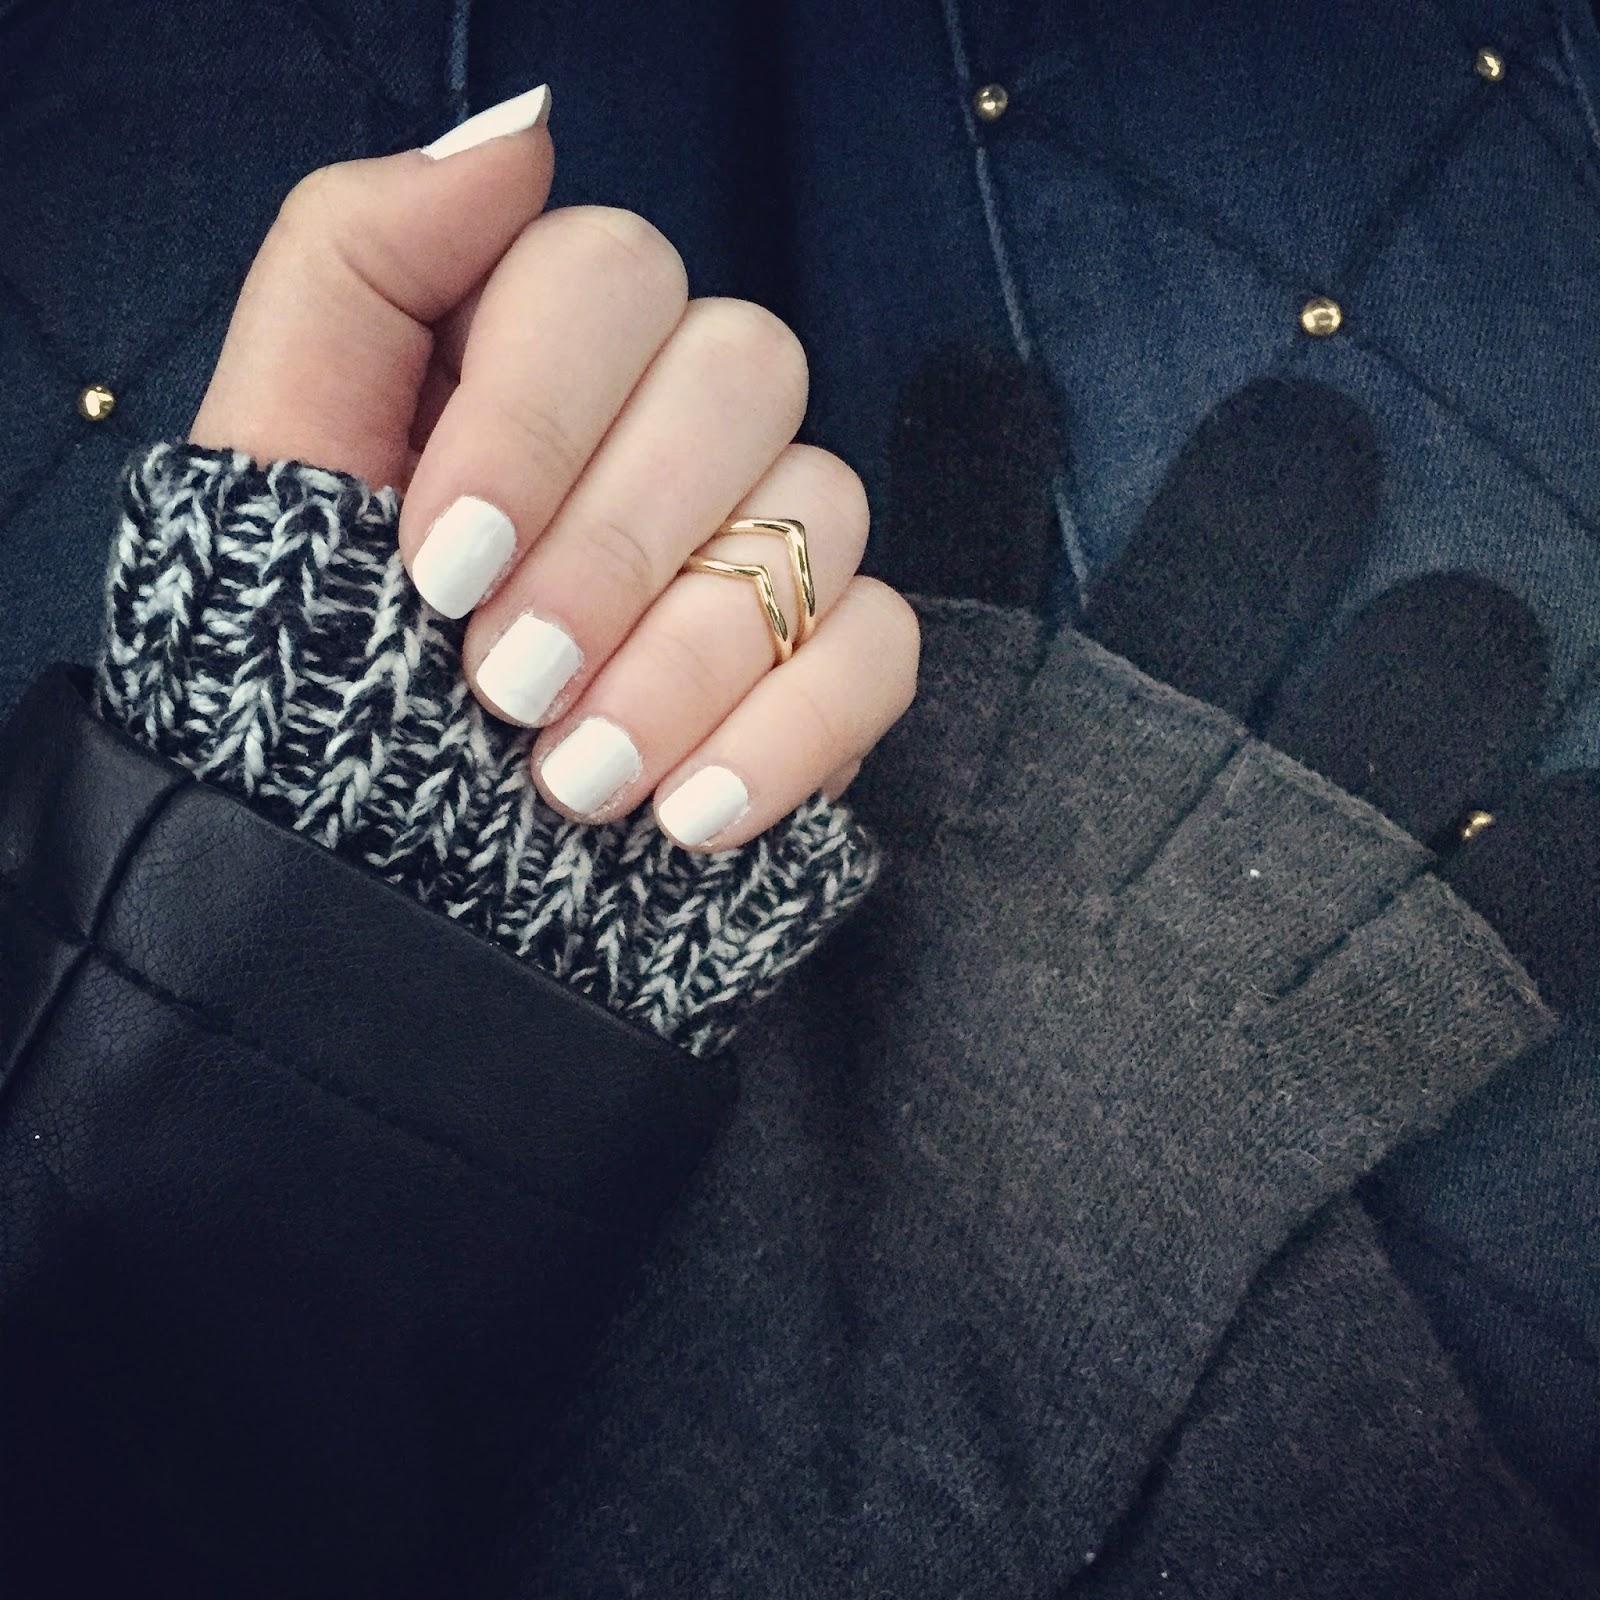 Favorite nail trend: Bright white